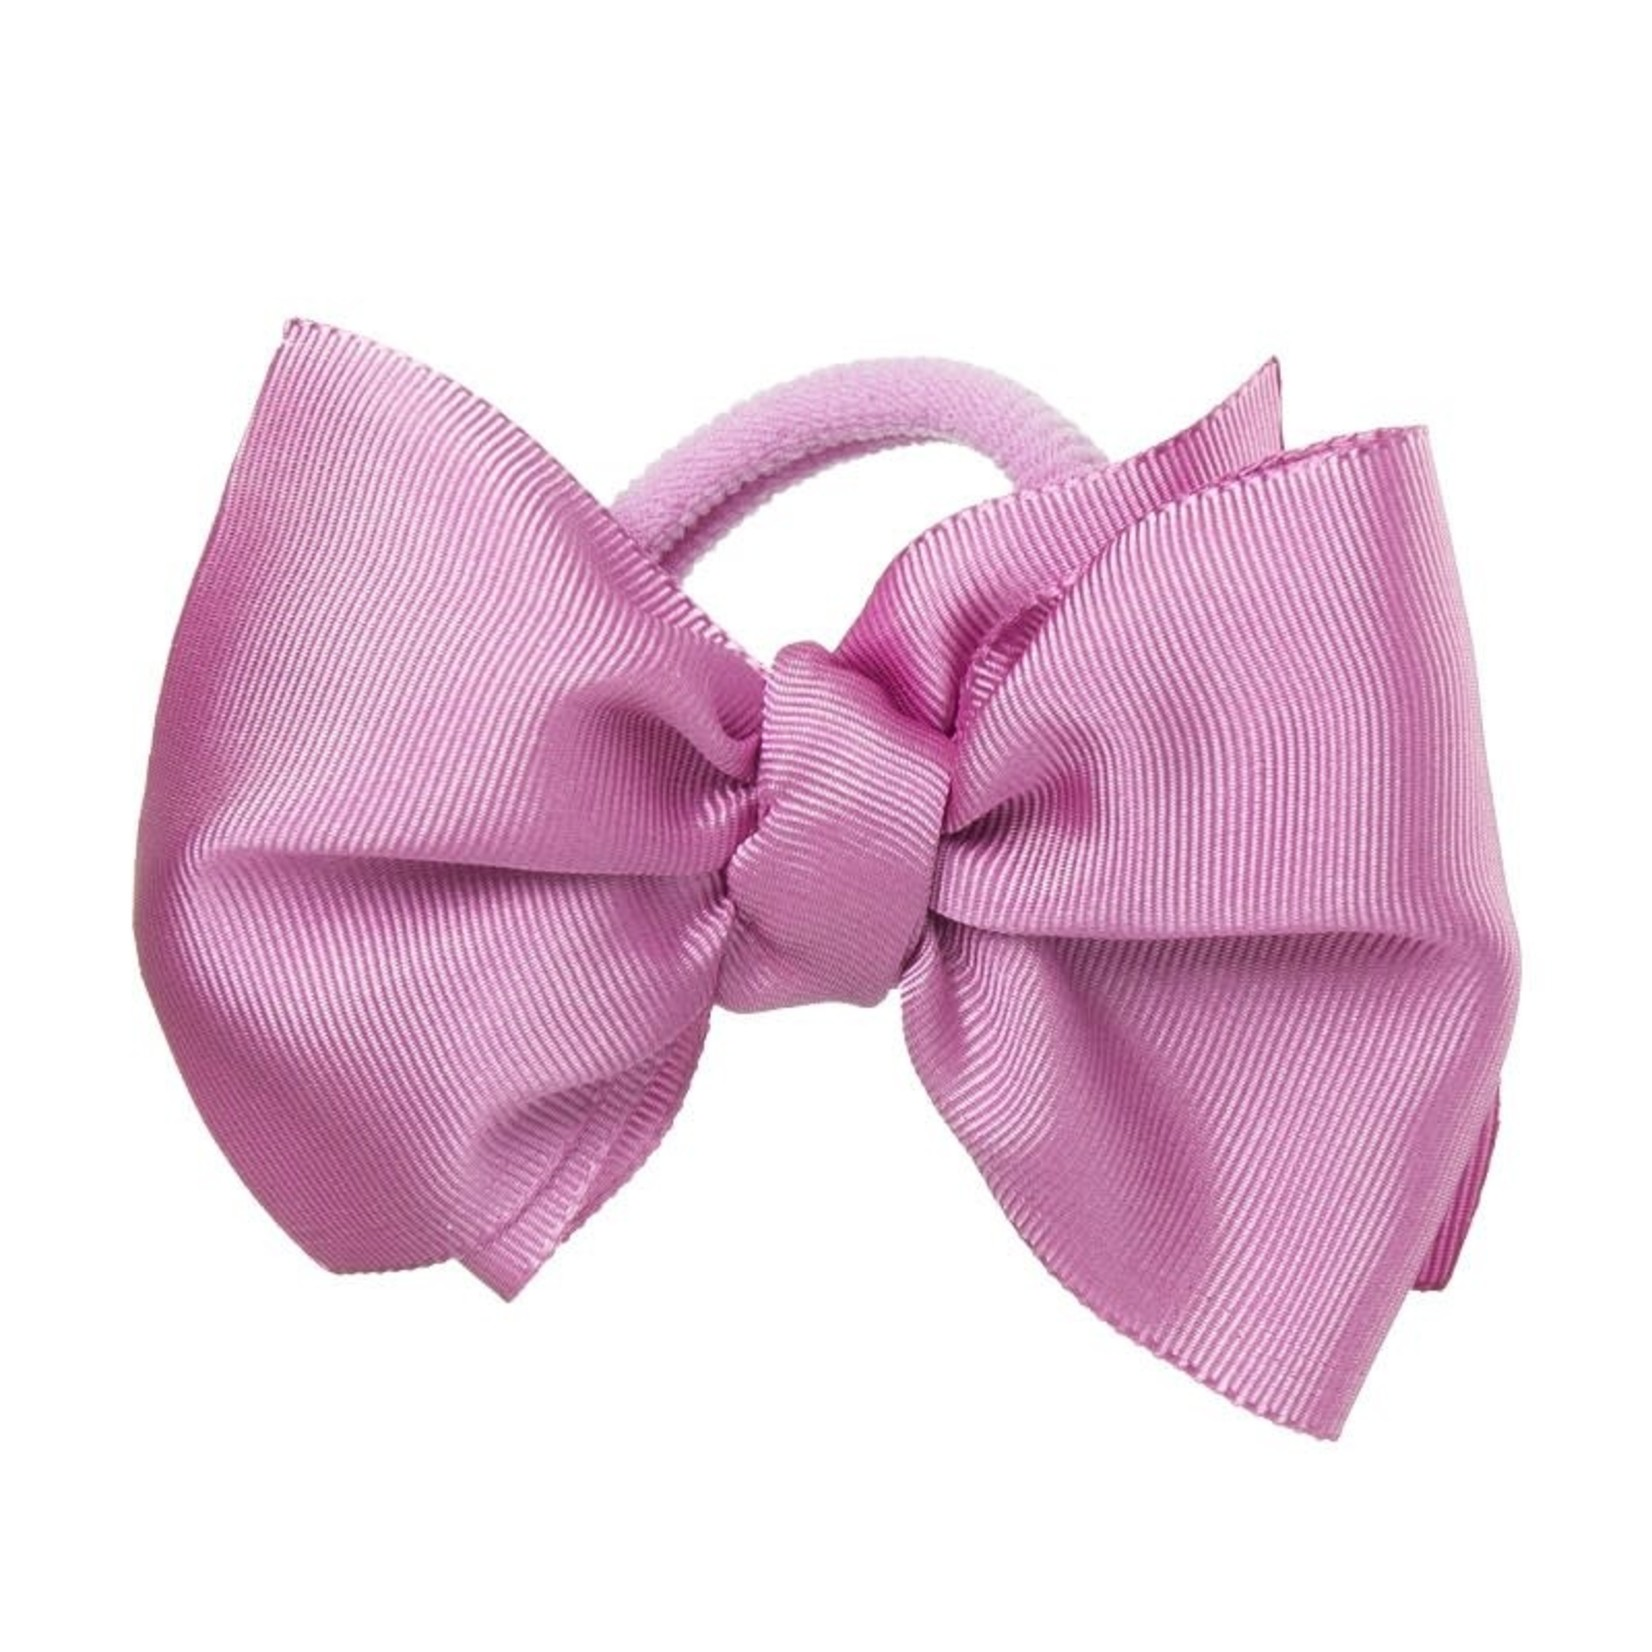 Siena Hair Bow - Rosa